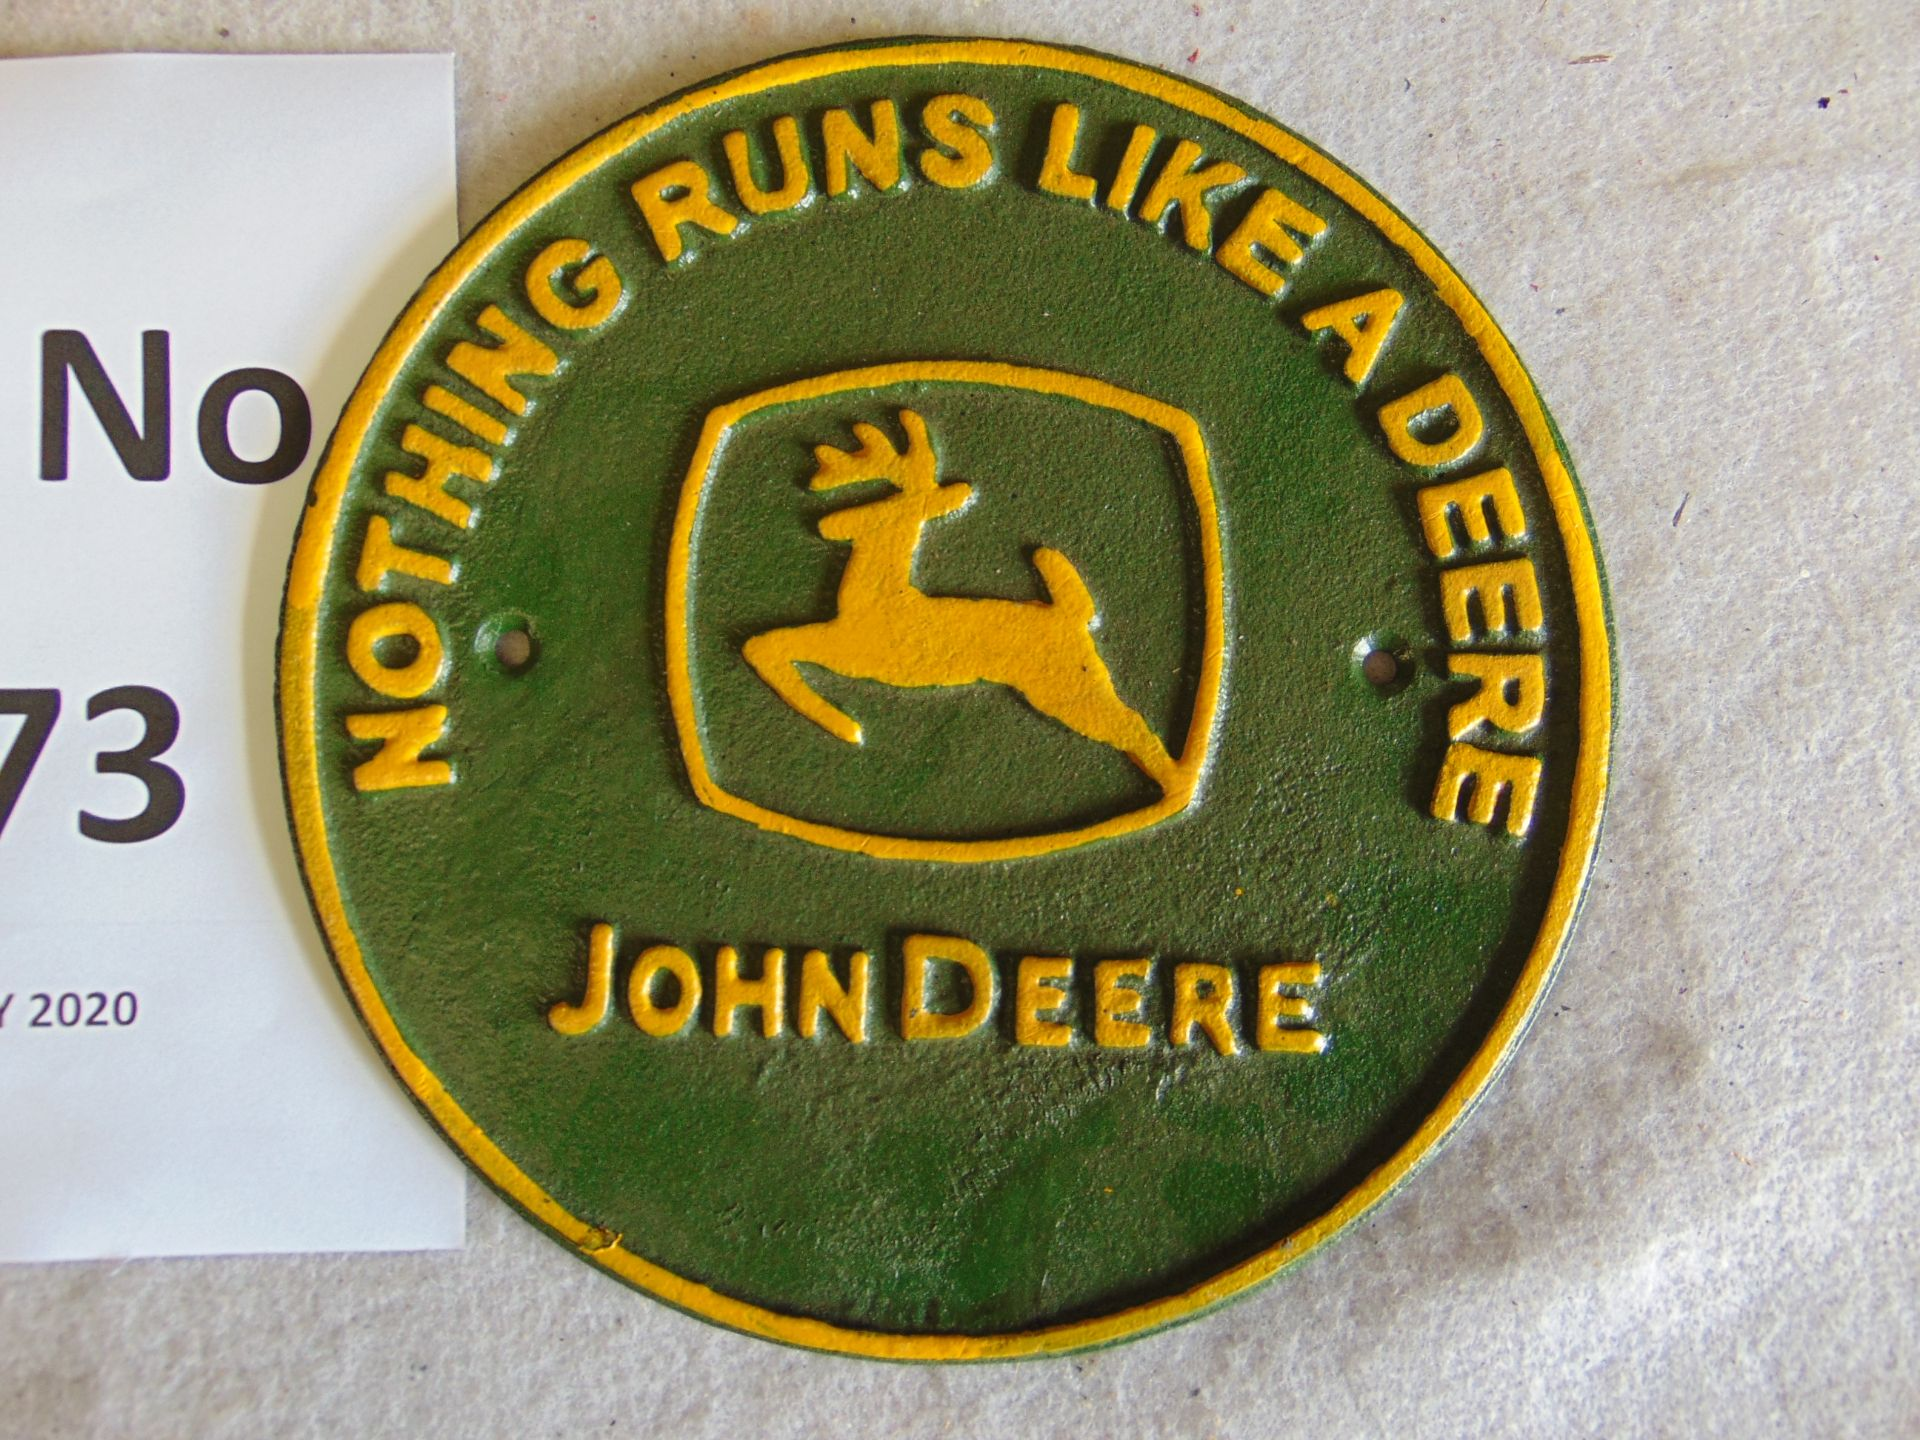 Lot 273 - Unissued John Deere Cast Iron Wall Plaque